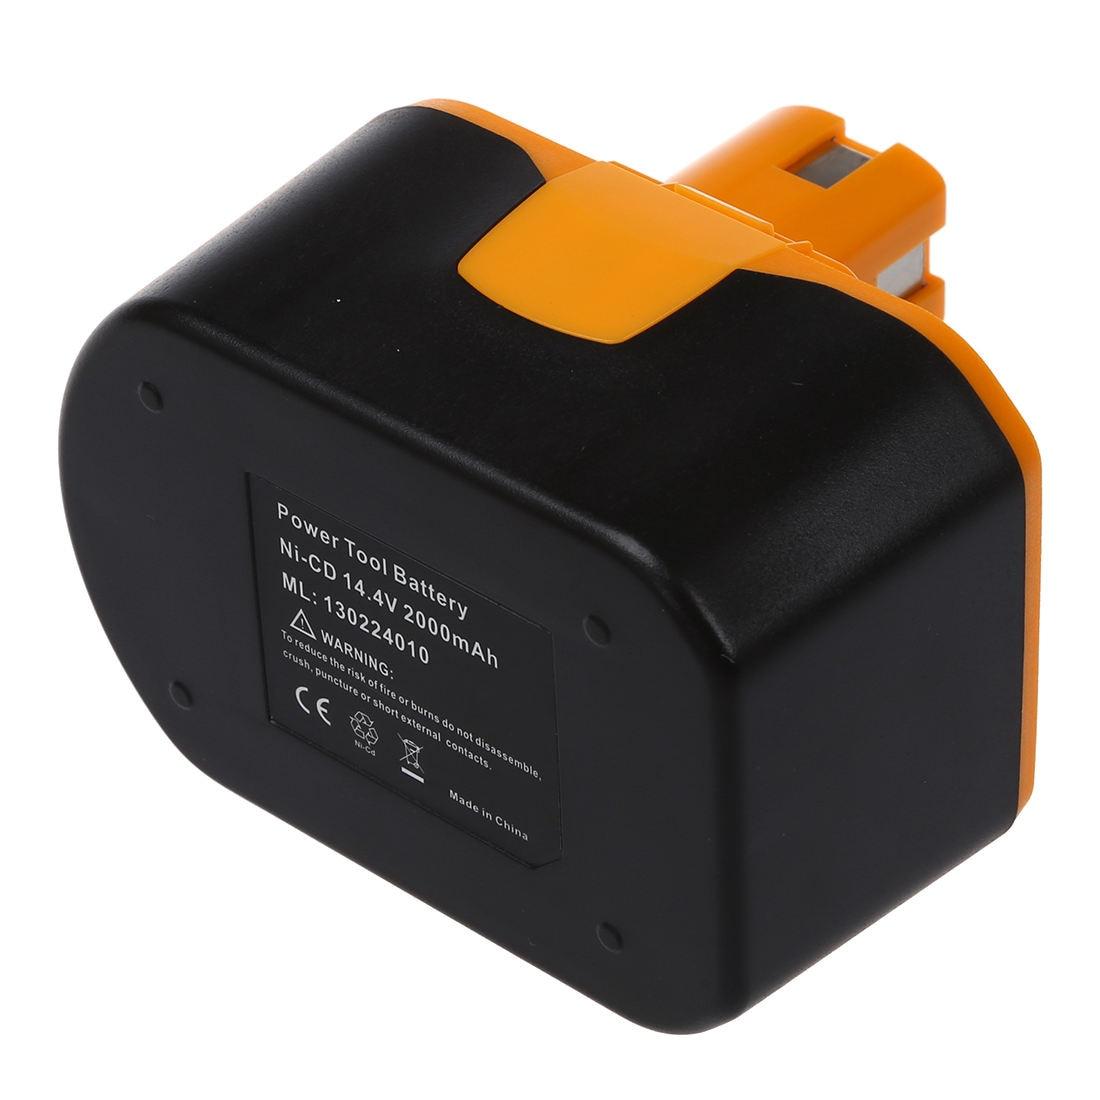 Запасная батарея для электроинструмента RYOBI 14,4 V, RY62, RY6200, RY6201, RY6202, 130224010, и т. Д. Черный и желтый